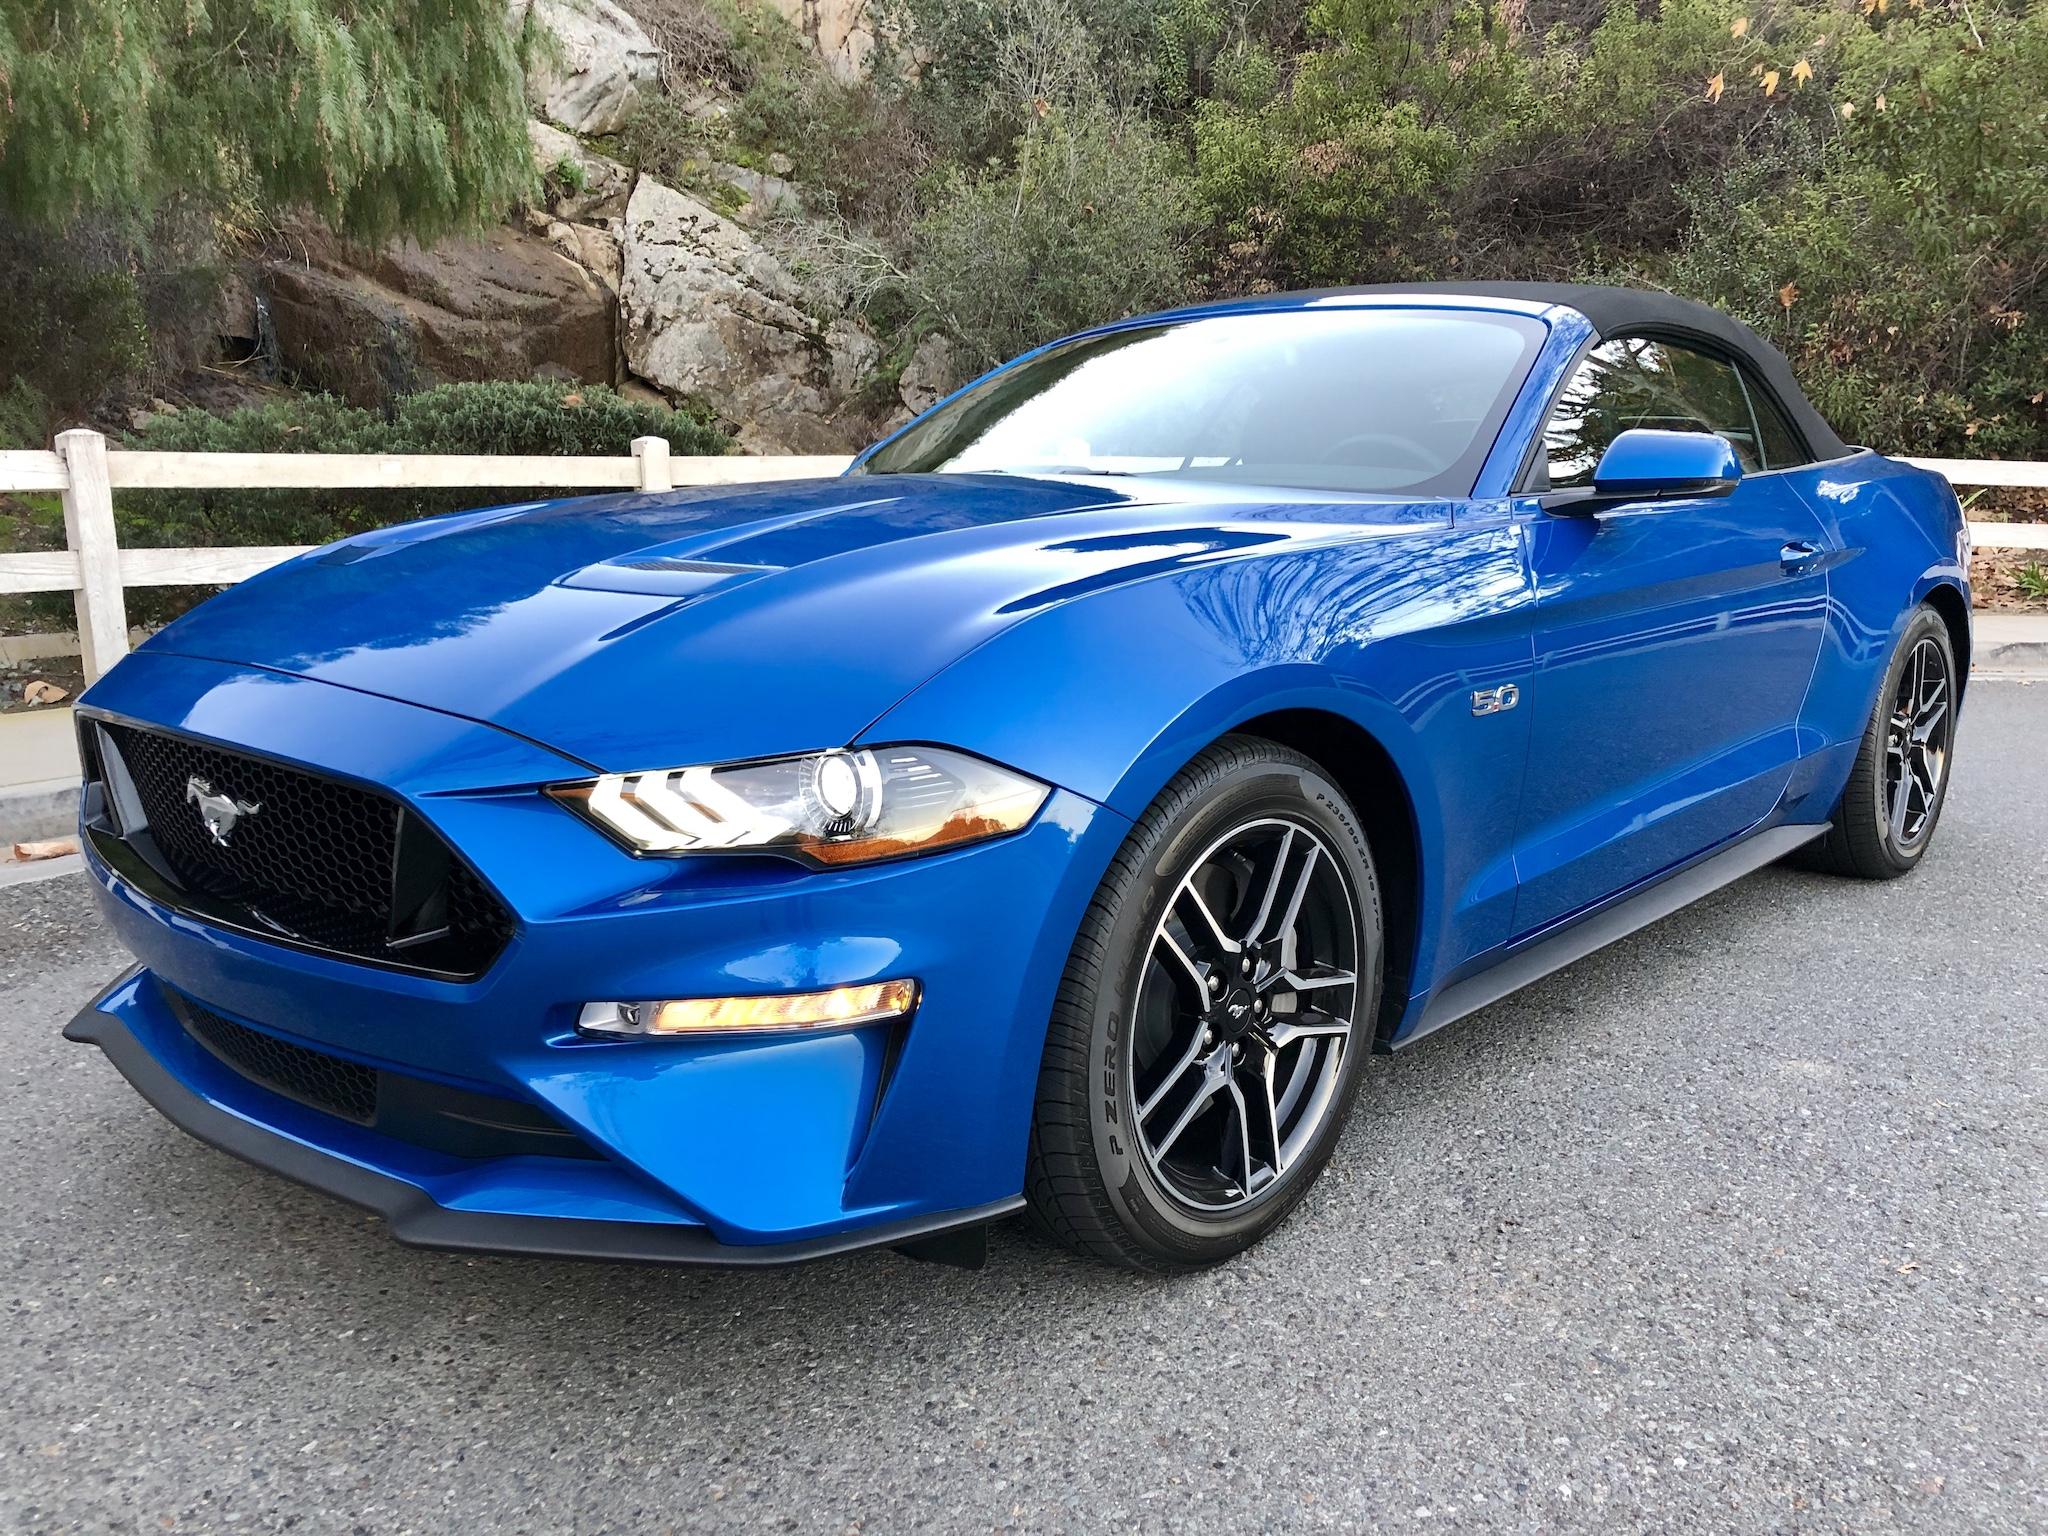 Duke's Drive: 2019 Ford Mustang GT Convertible - Chris Duke